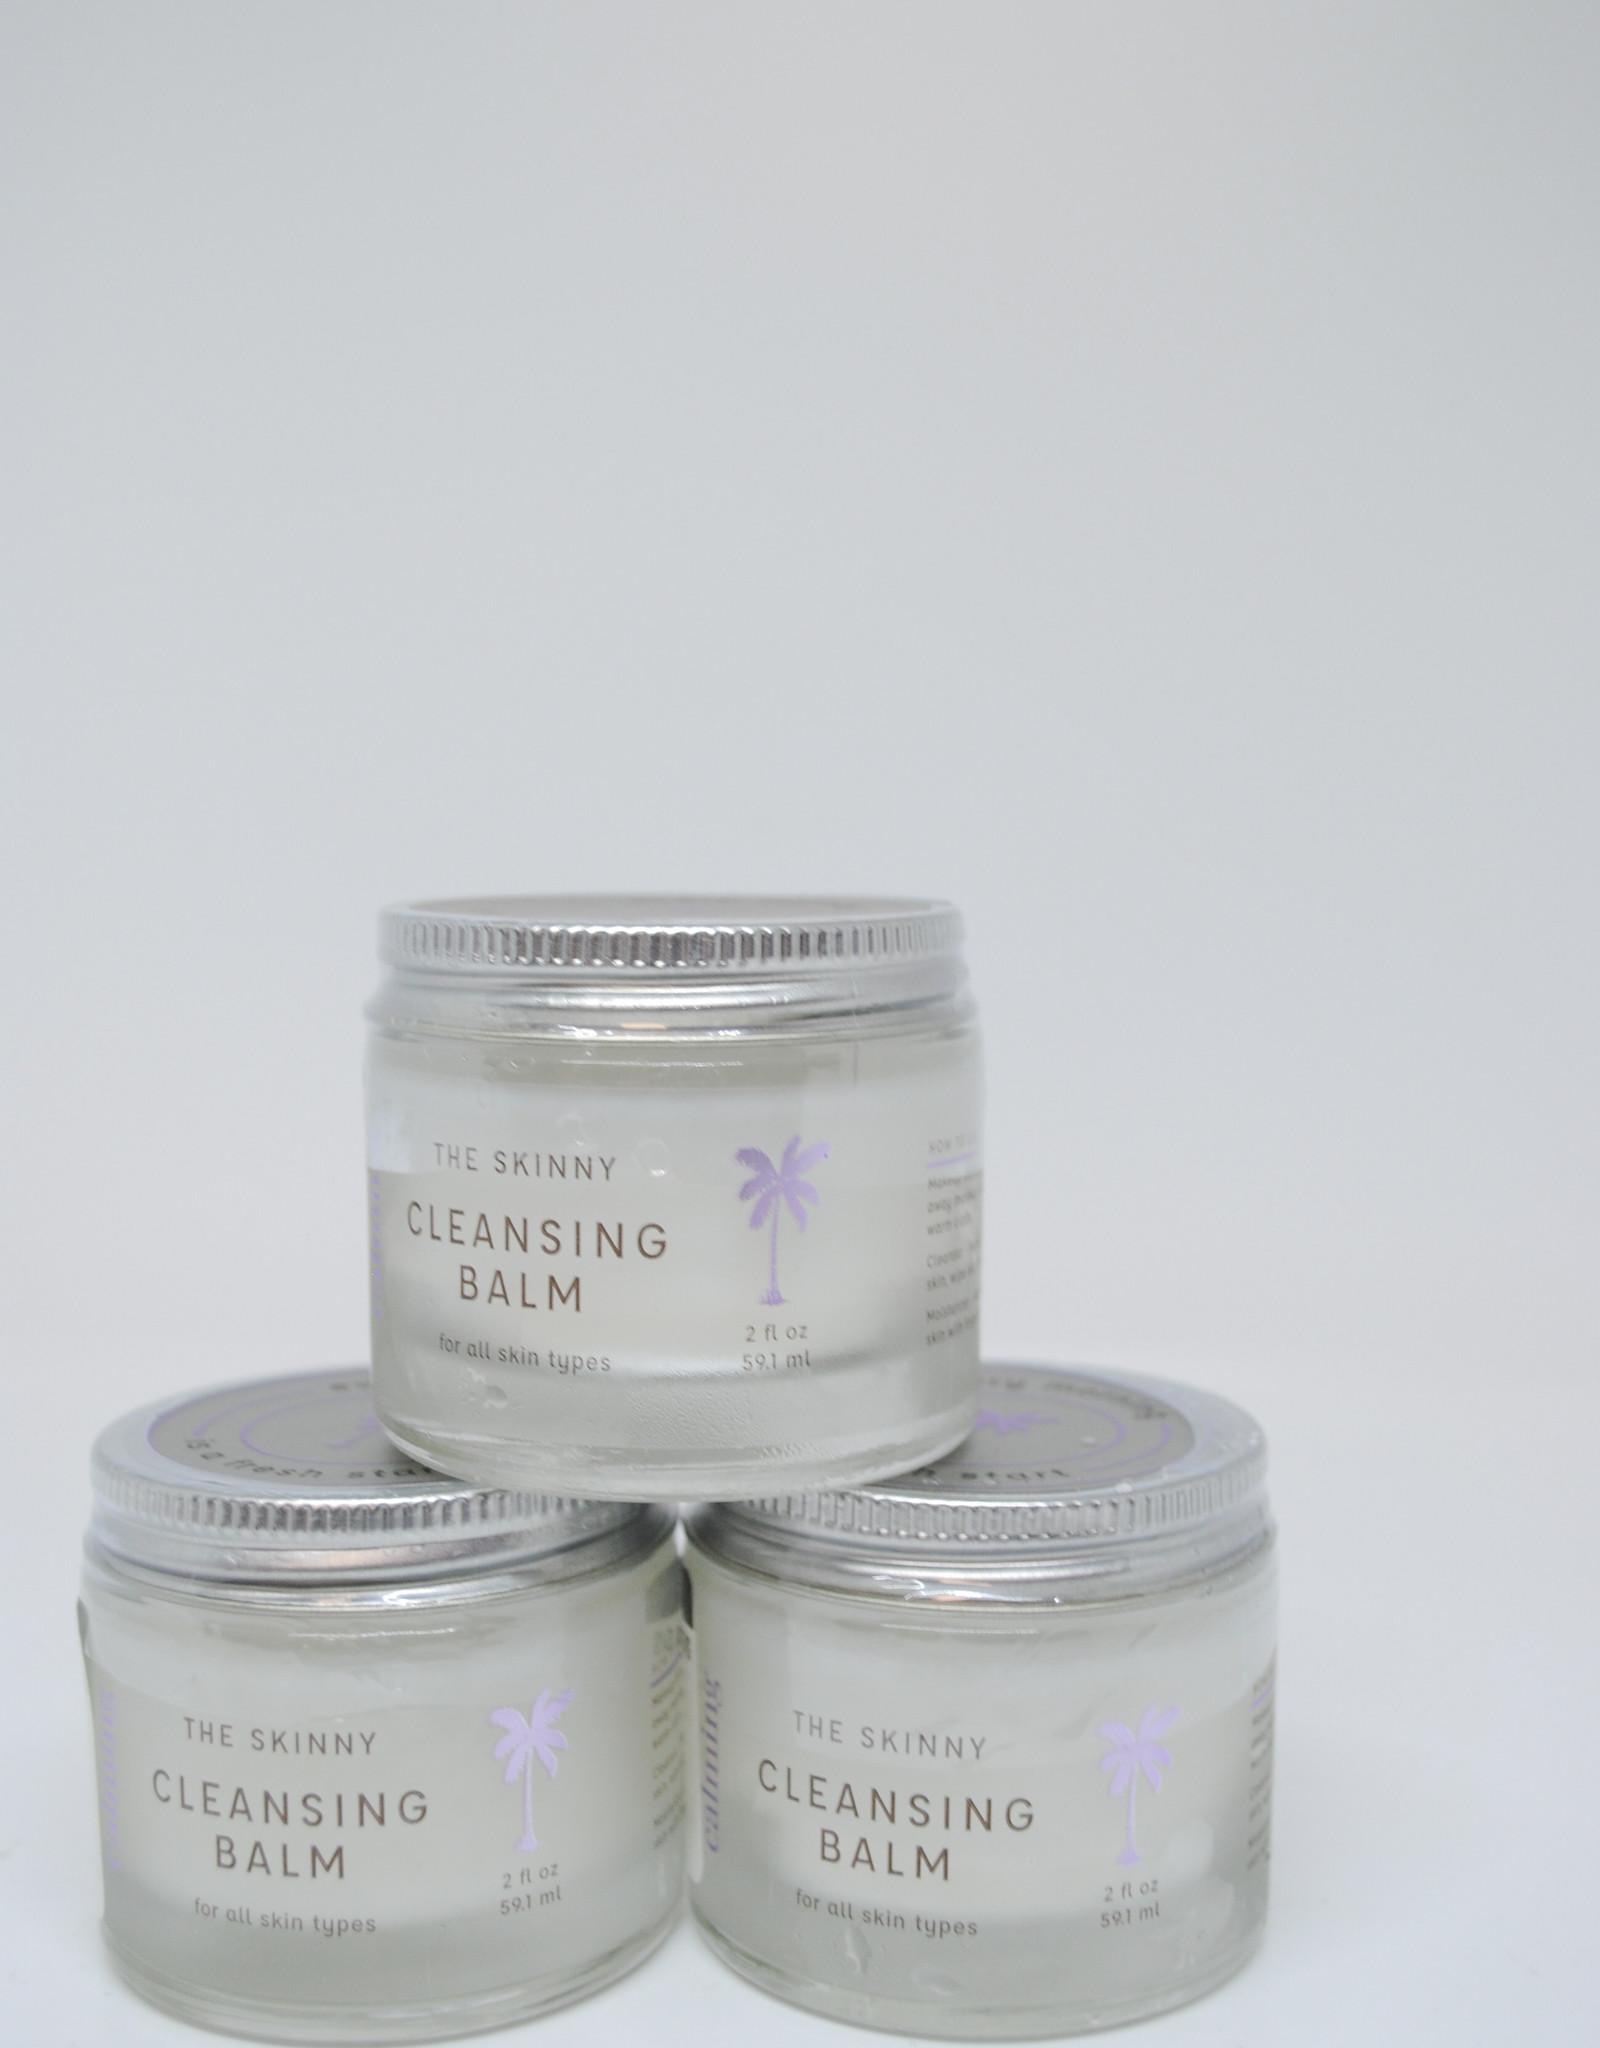 Skinny & Co Skinny Cleansing Balm